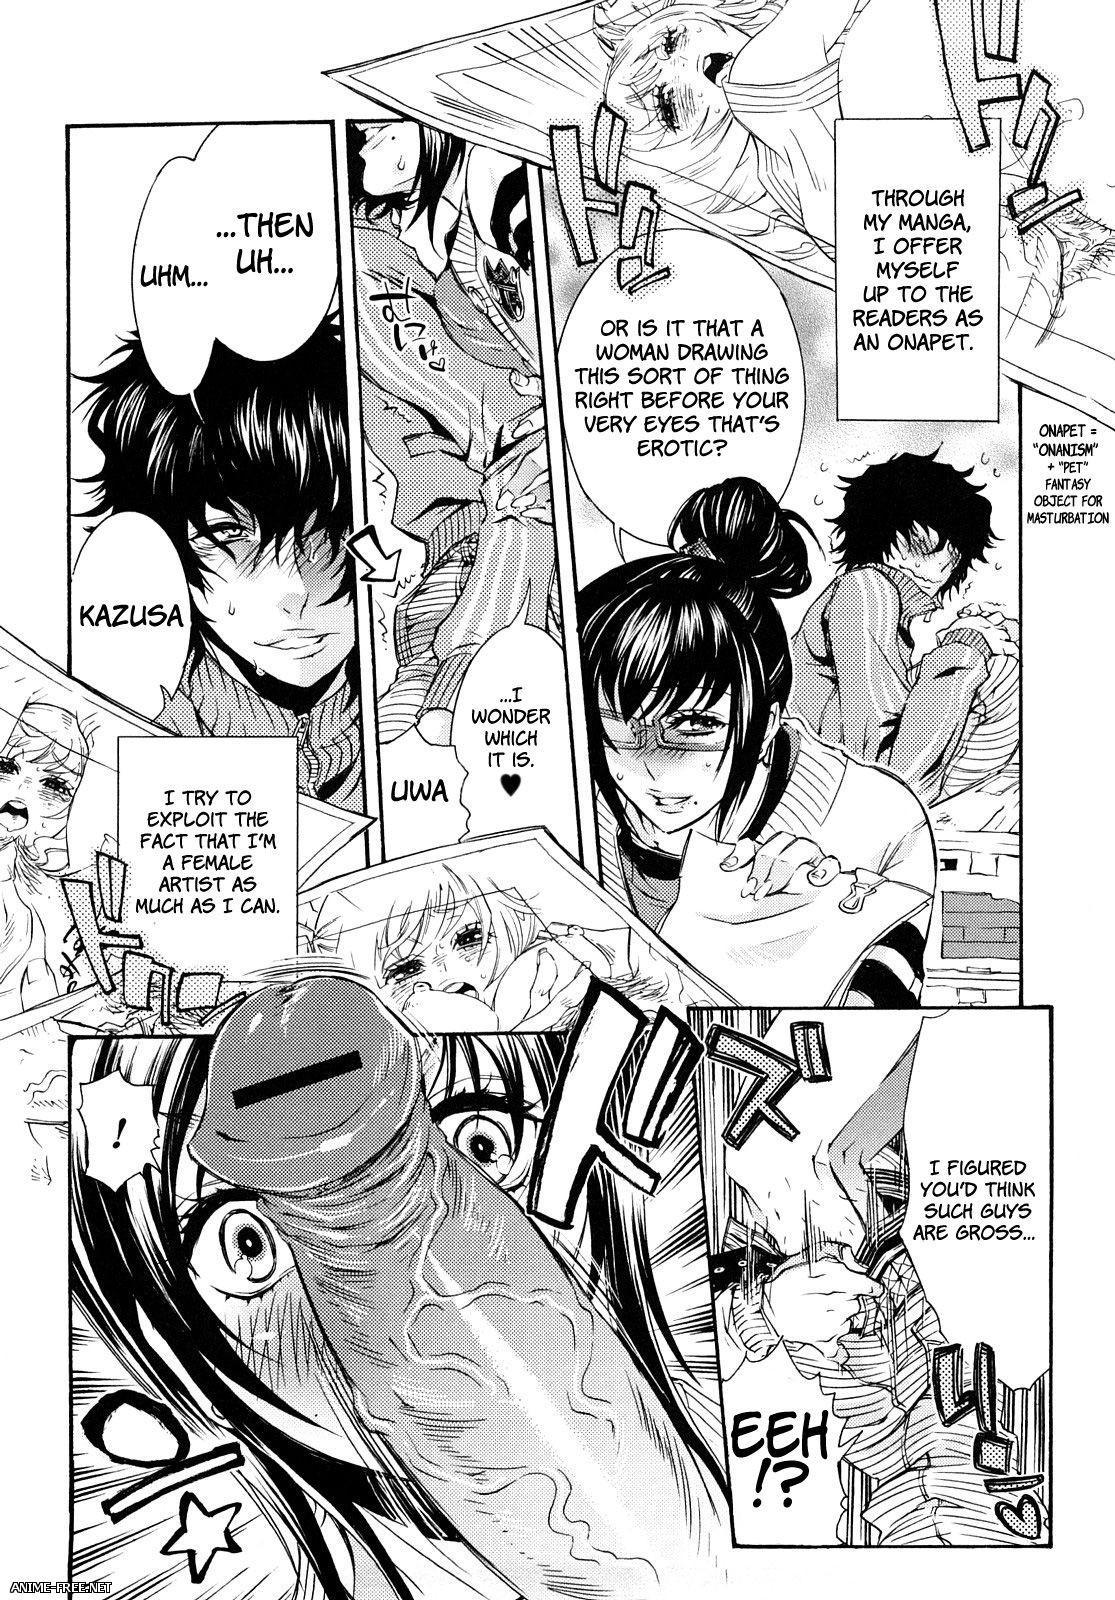 Hattori Mitsuka / Sadistic Mary — Сборник хентай манги [Ptcen] [JAP,ENG] Manga Hentai